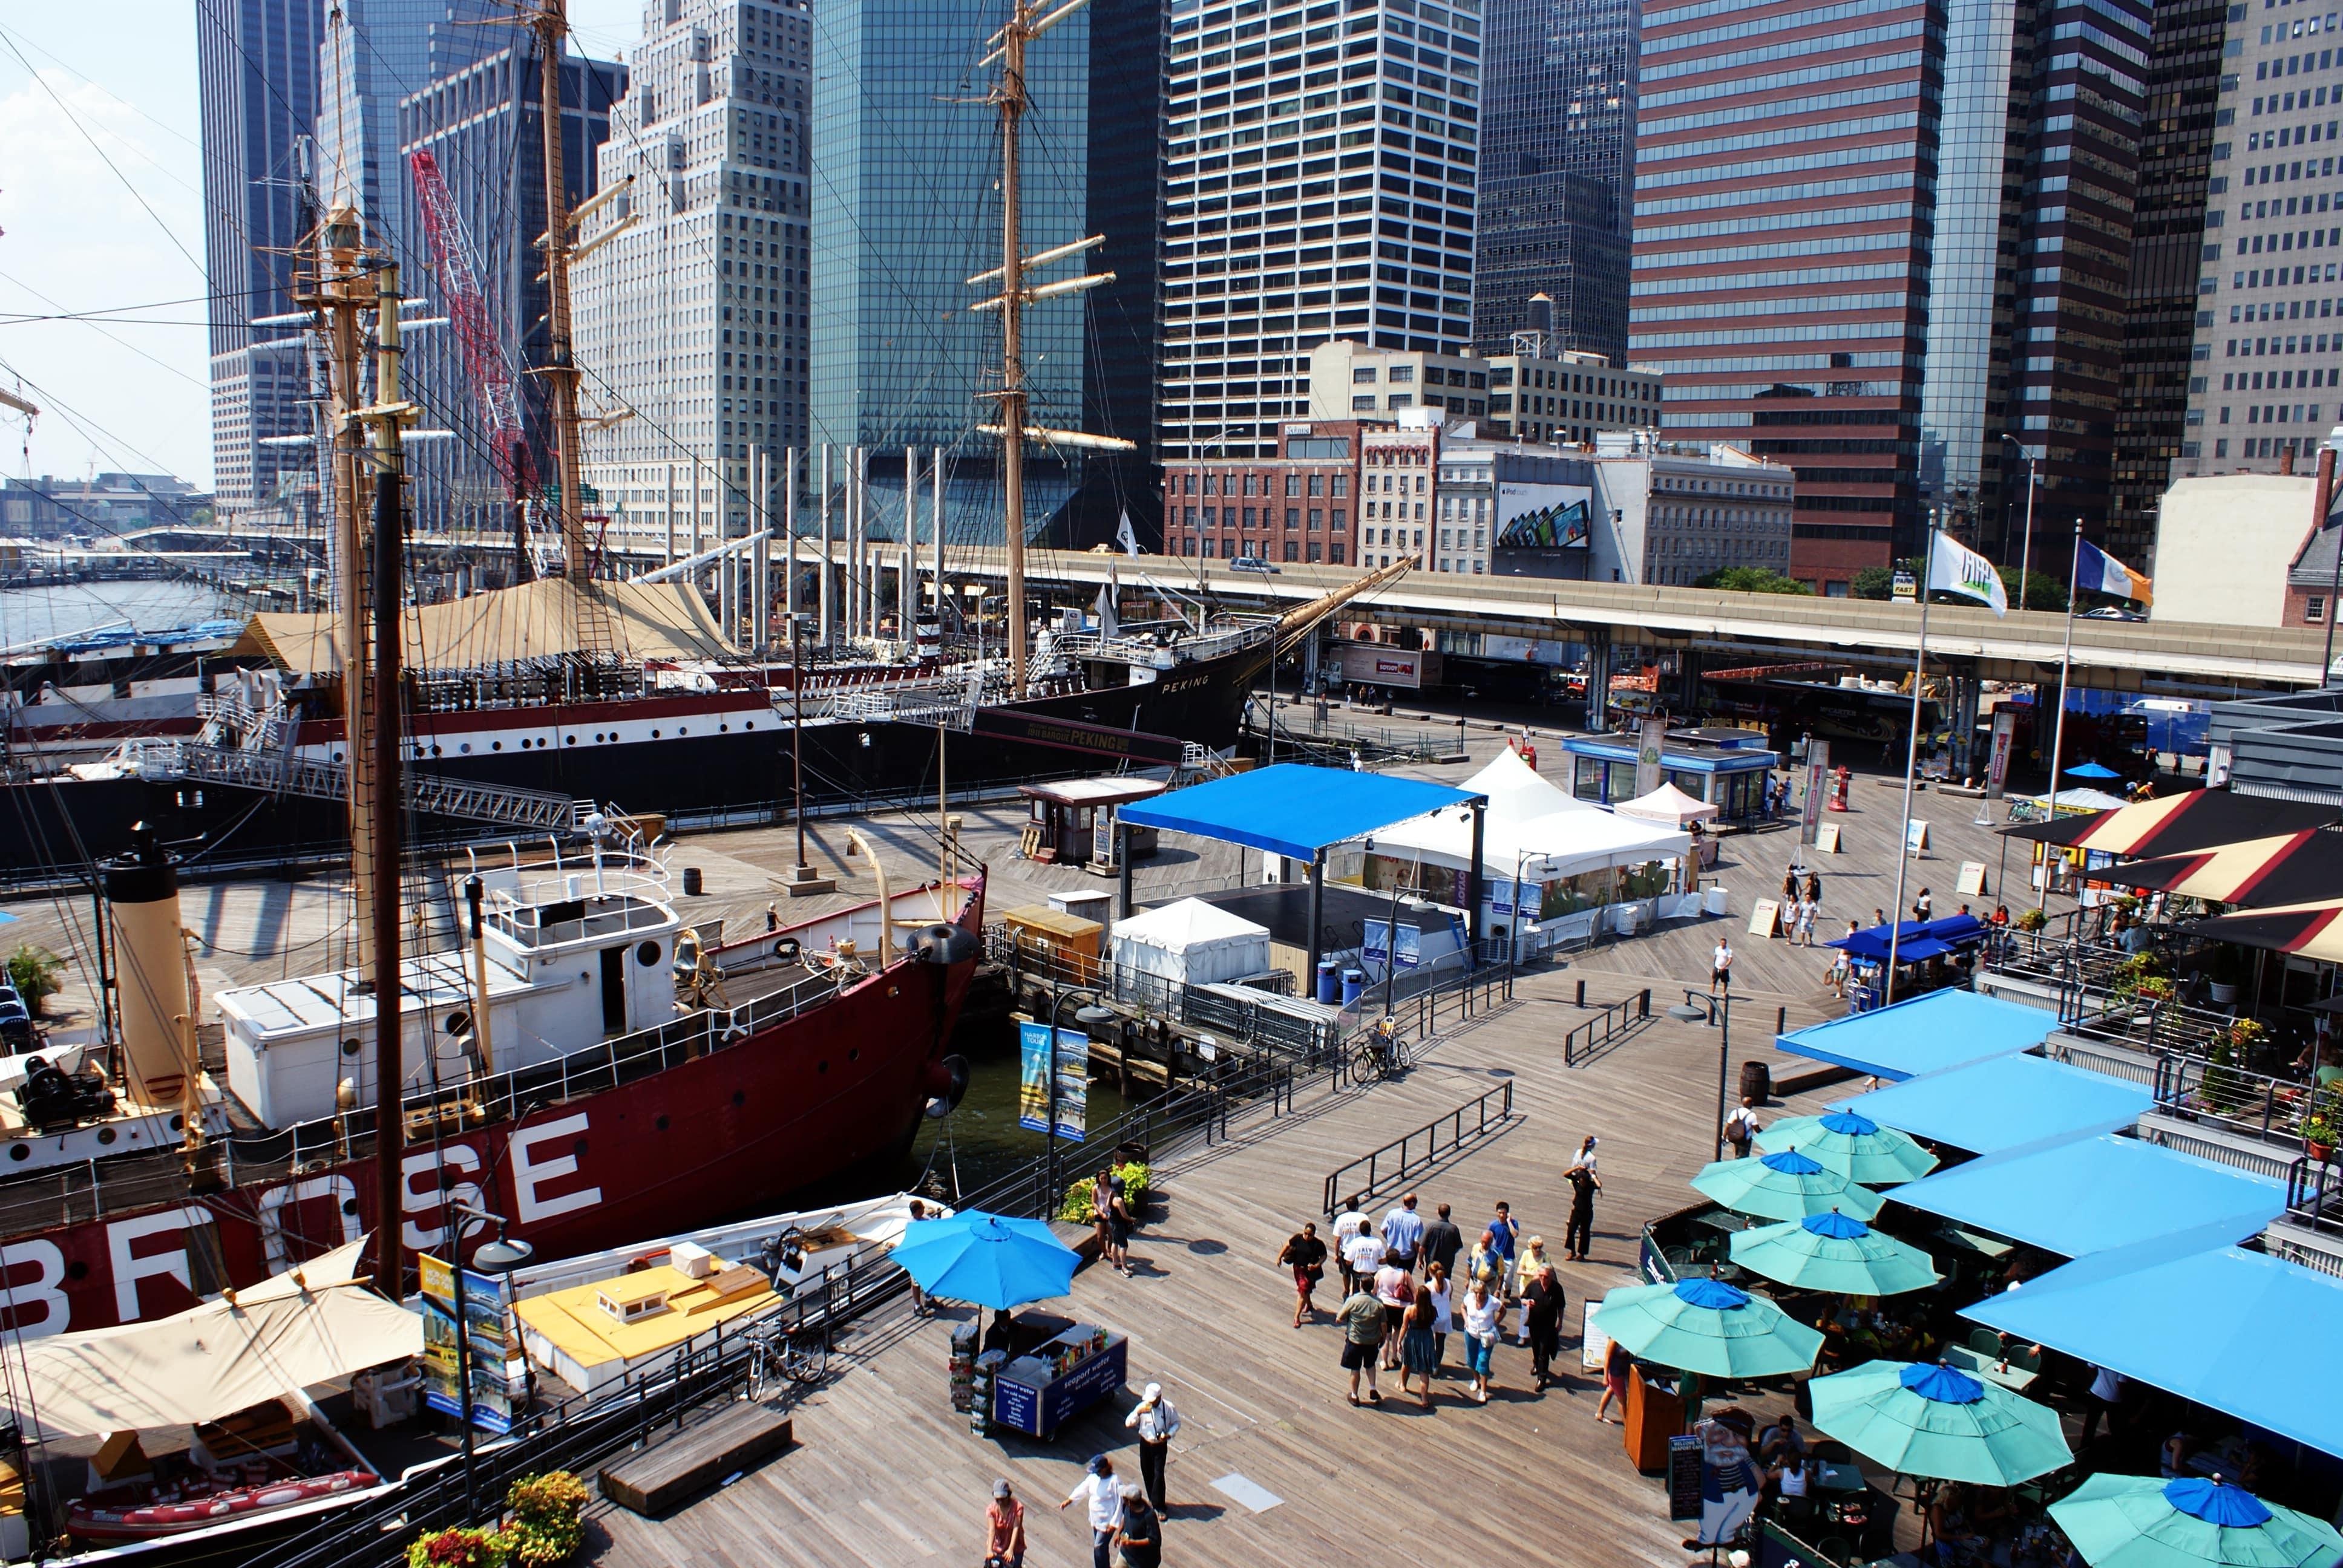 new-york-the-south-street-seaport-secret-world